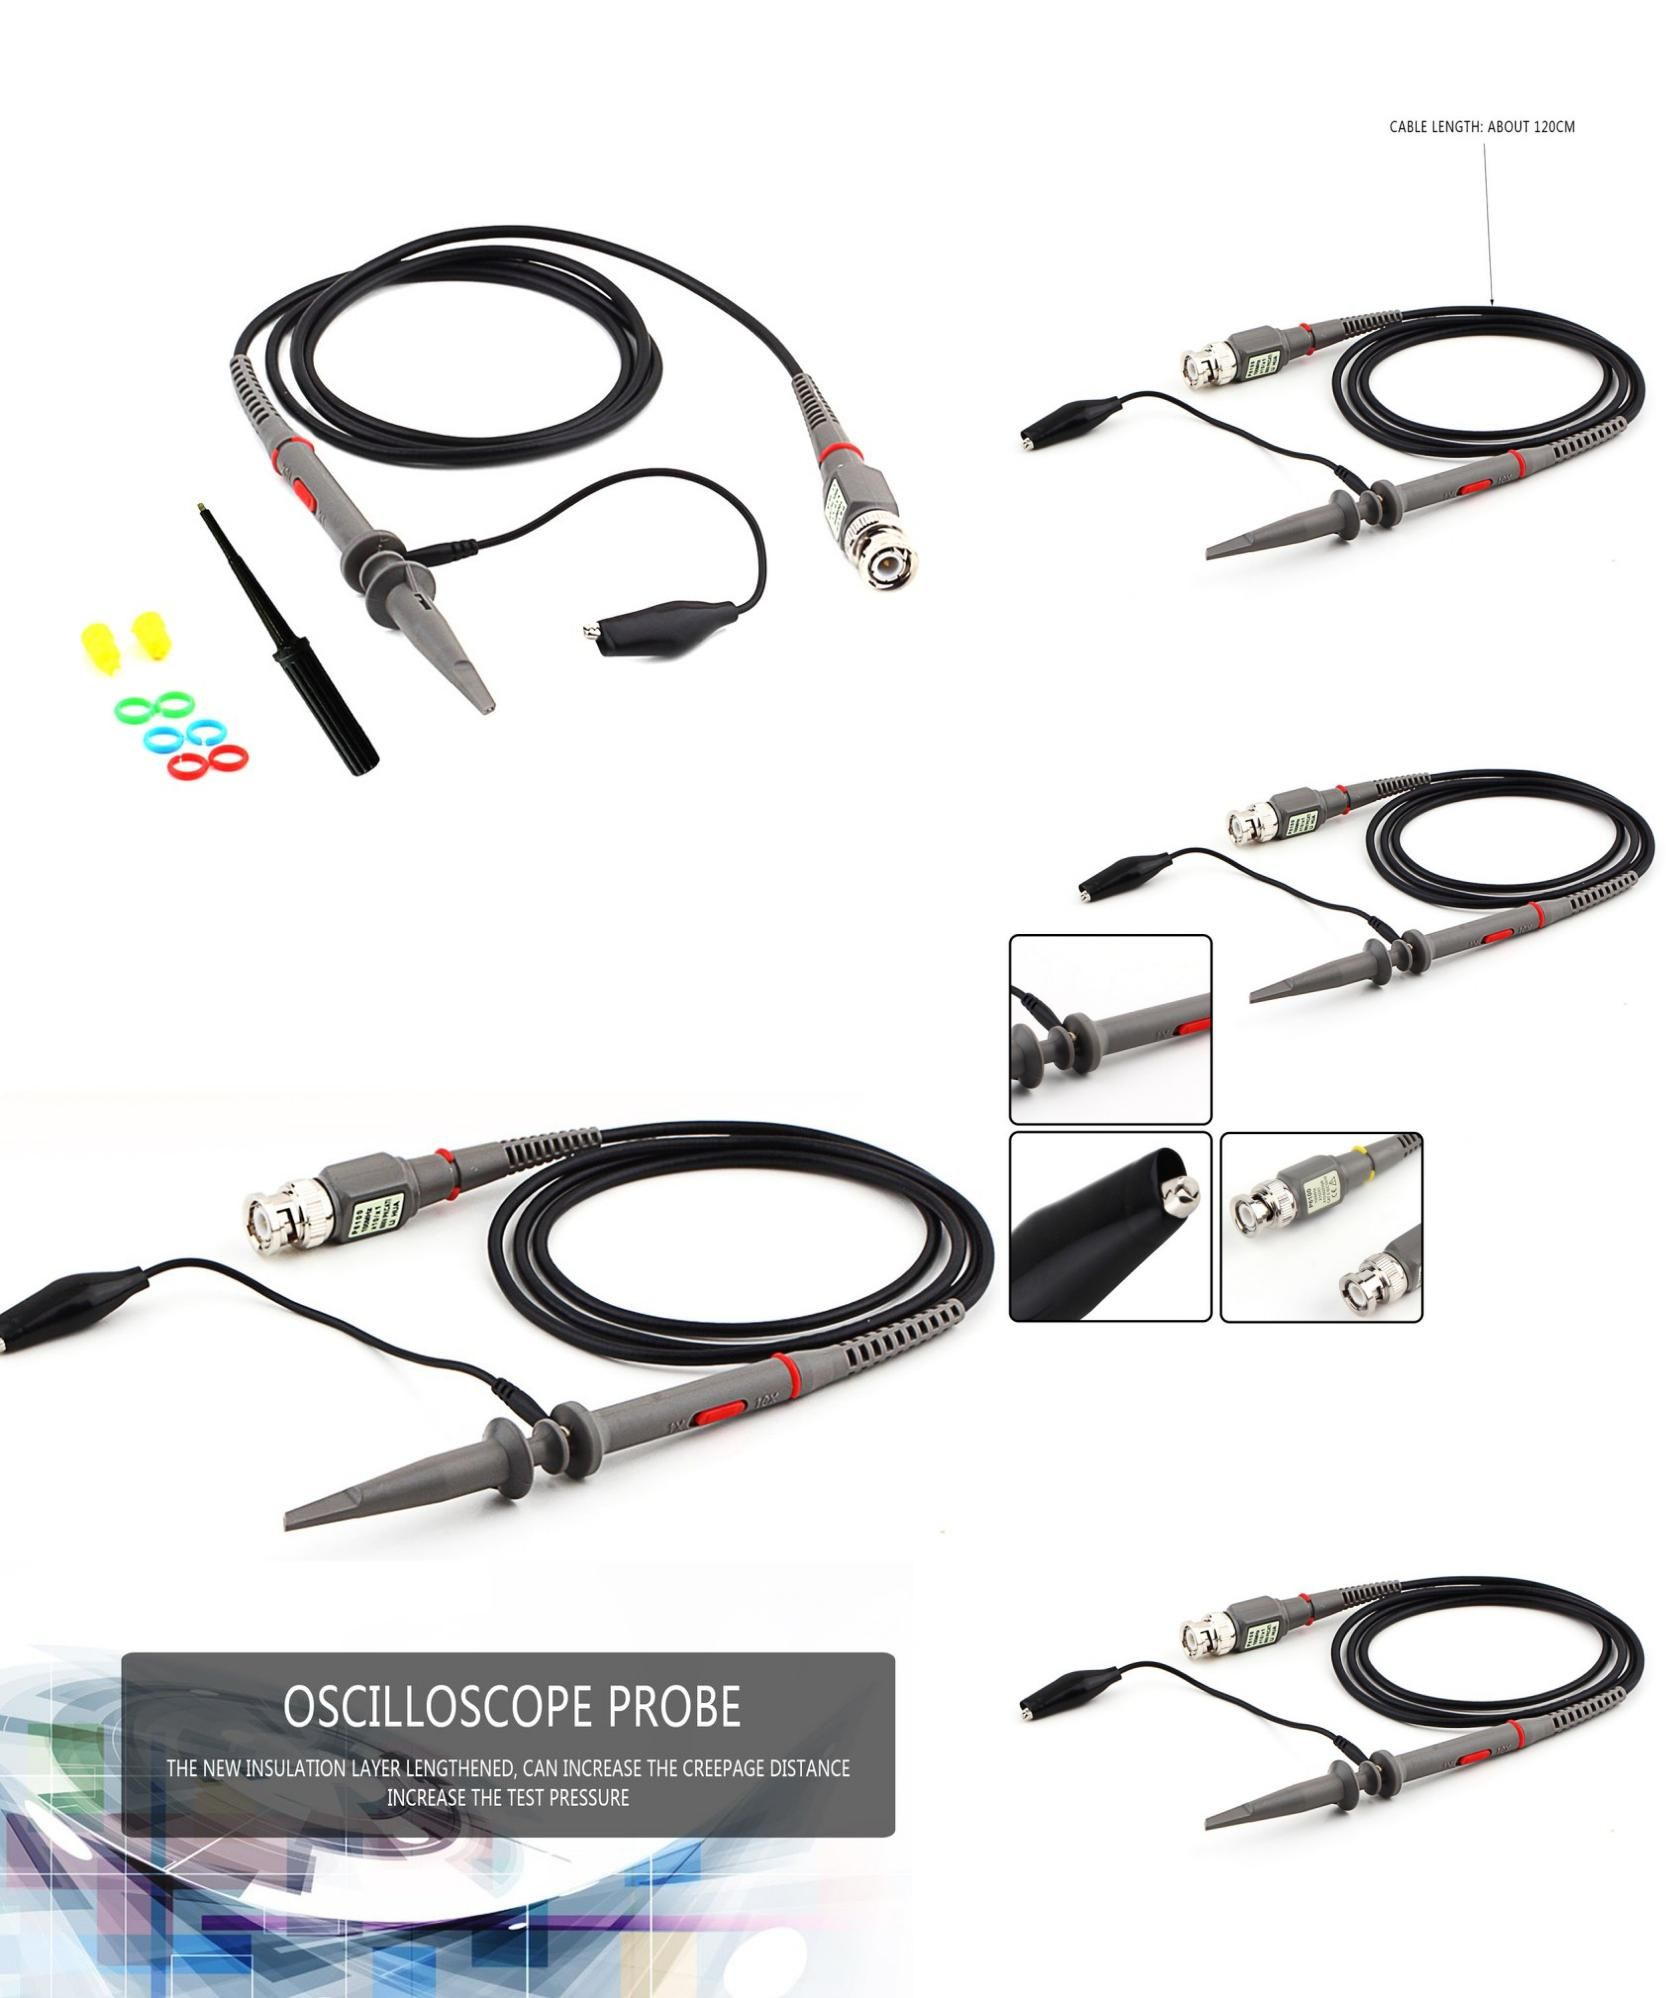 [Visit to Buy] 2017 New P6100 Oscilloscope 100mhz Osciloscopio Probe DC-100MHz Scope Clip Probe 100MHz Multimeter Probe #Advertisement